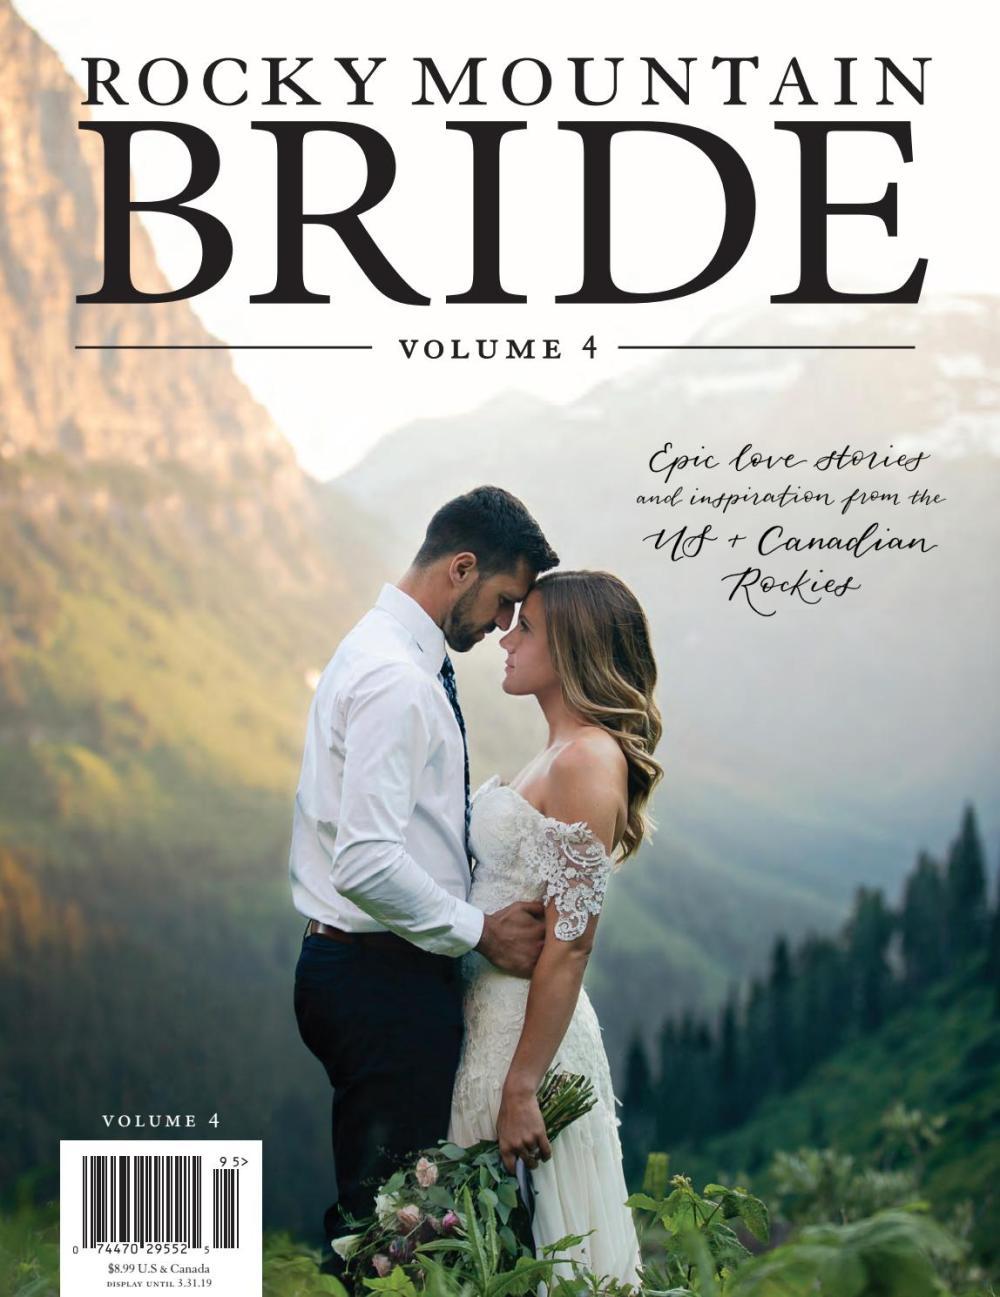 medium resolution of rocky mountain bride regional volume 4 by rocky mountain bride magazine issuu